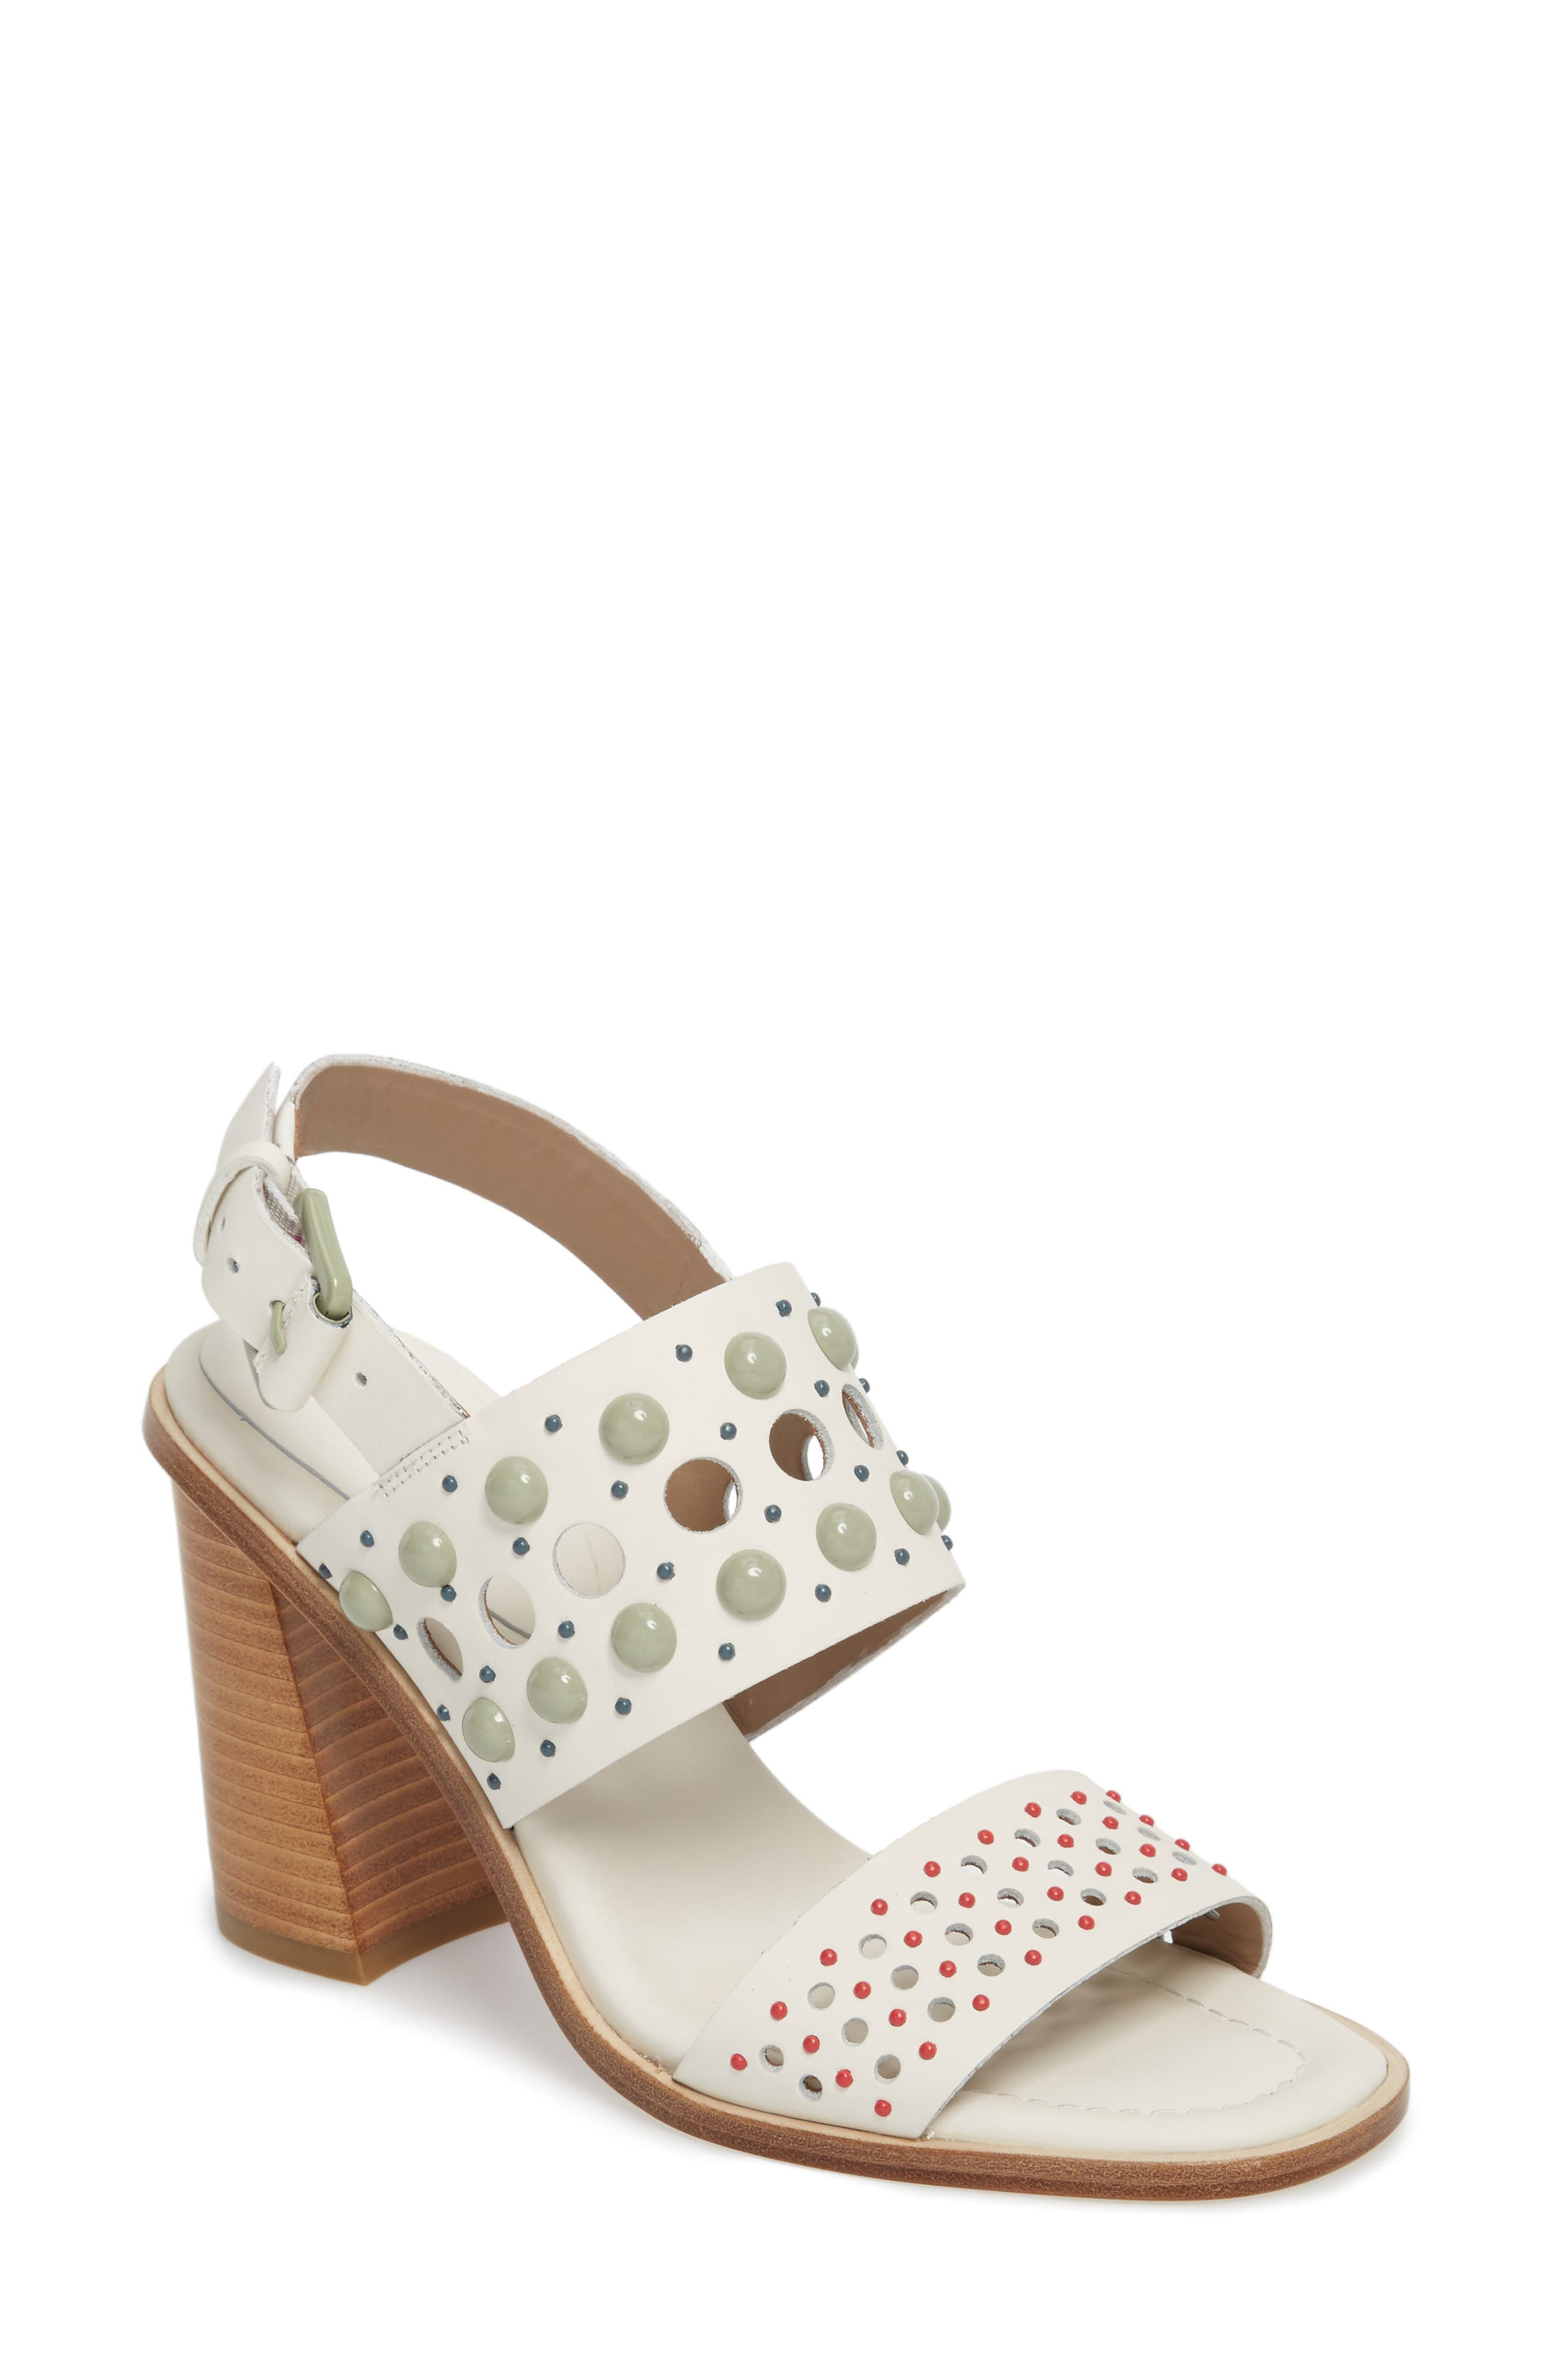 Estee Studded Sandal,                         Main,                         color, 100